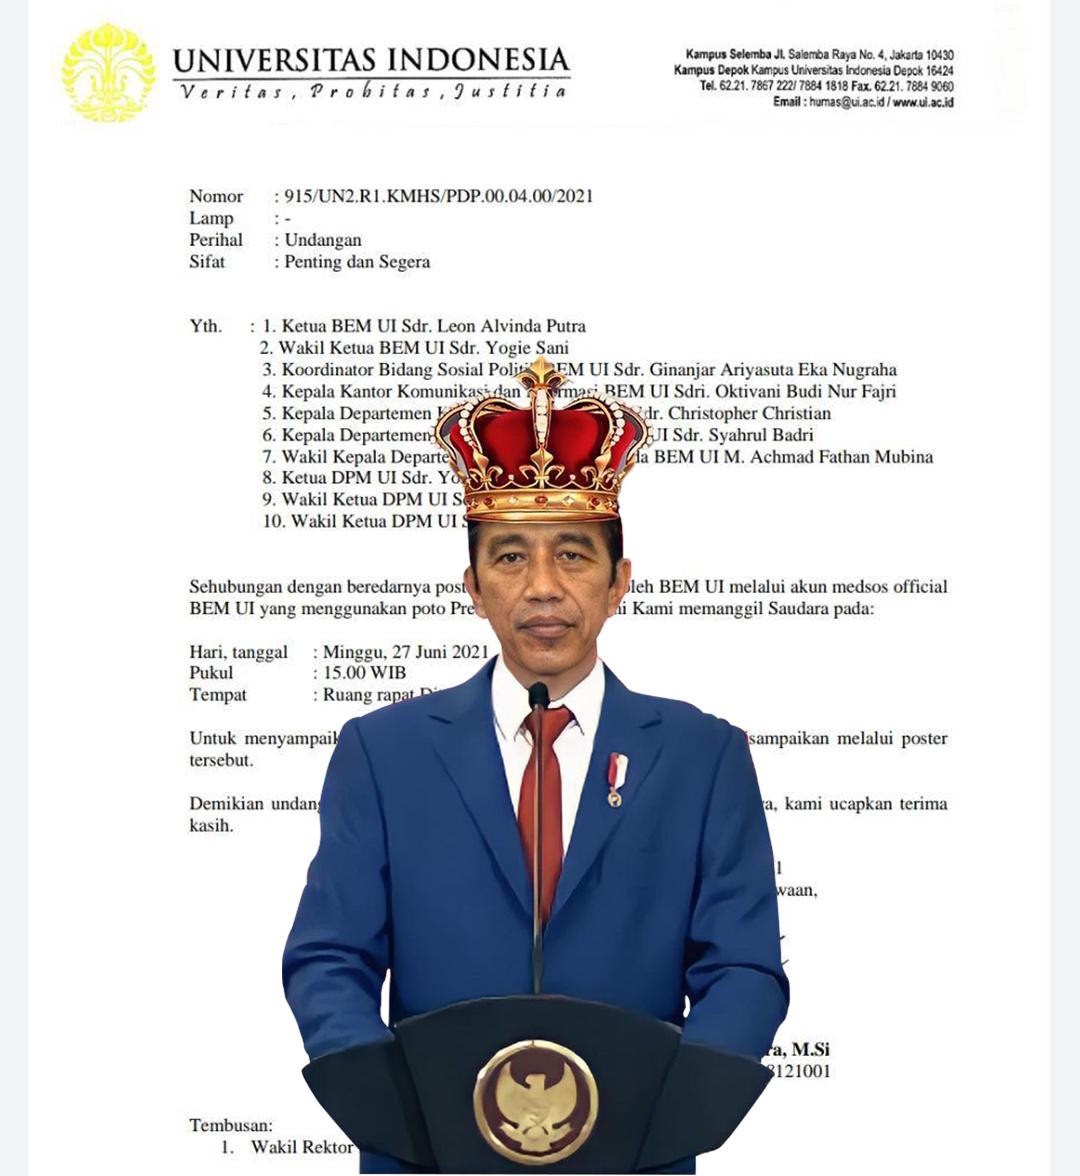 Imbas Kritik Jokowi, UI Panggil Fungsionaris BEM UI dan DPM UI